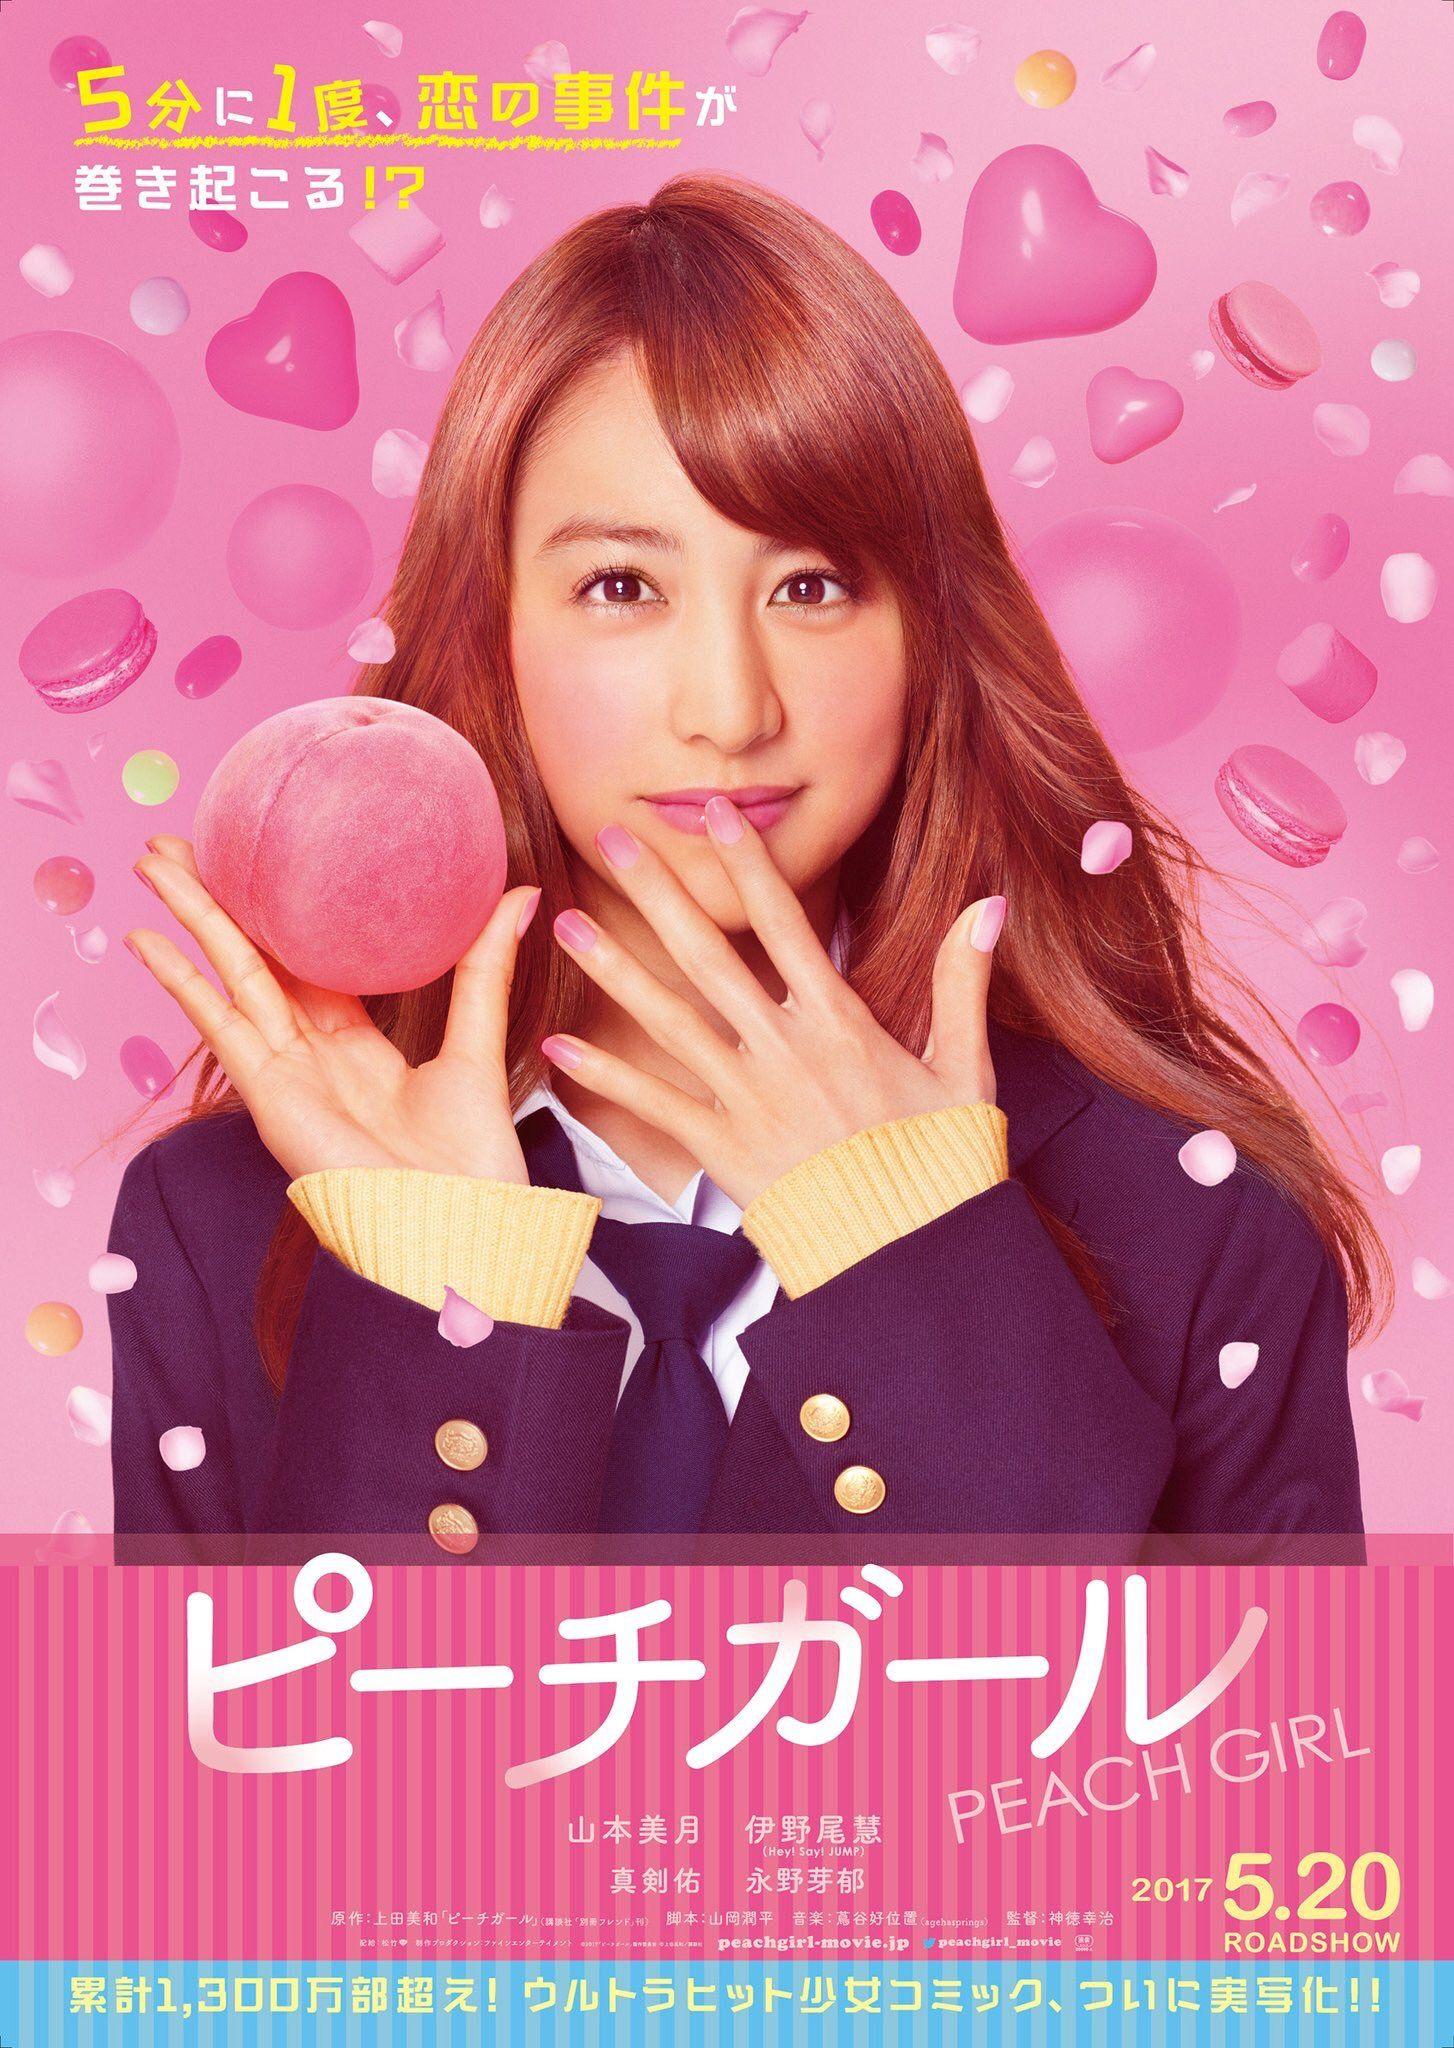 Inoue mao dating 2019 imdb